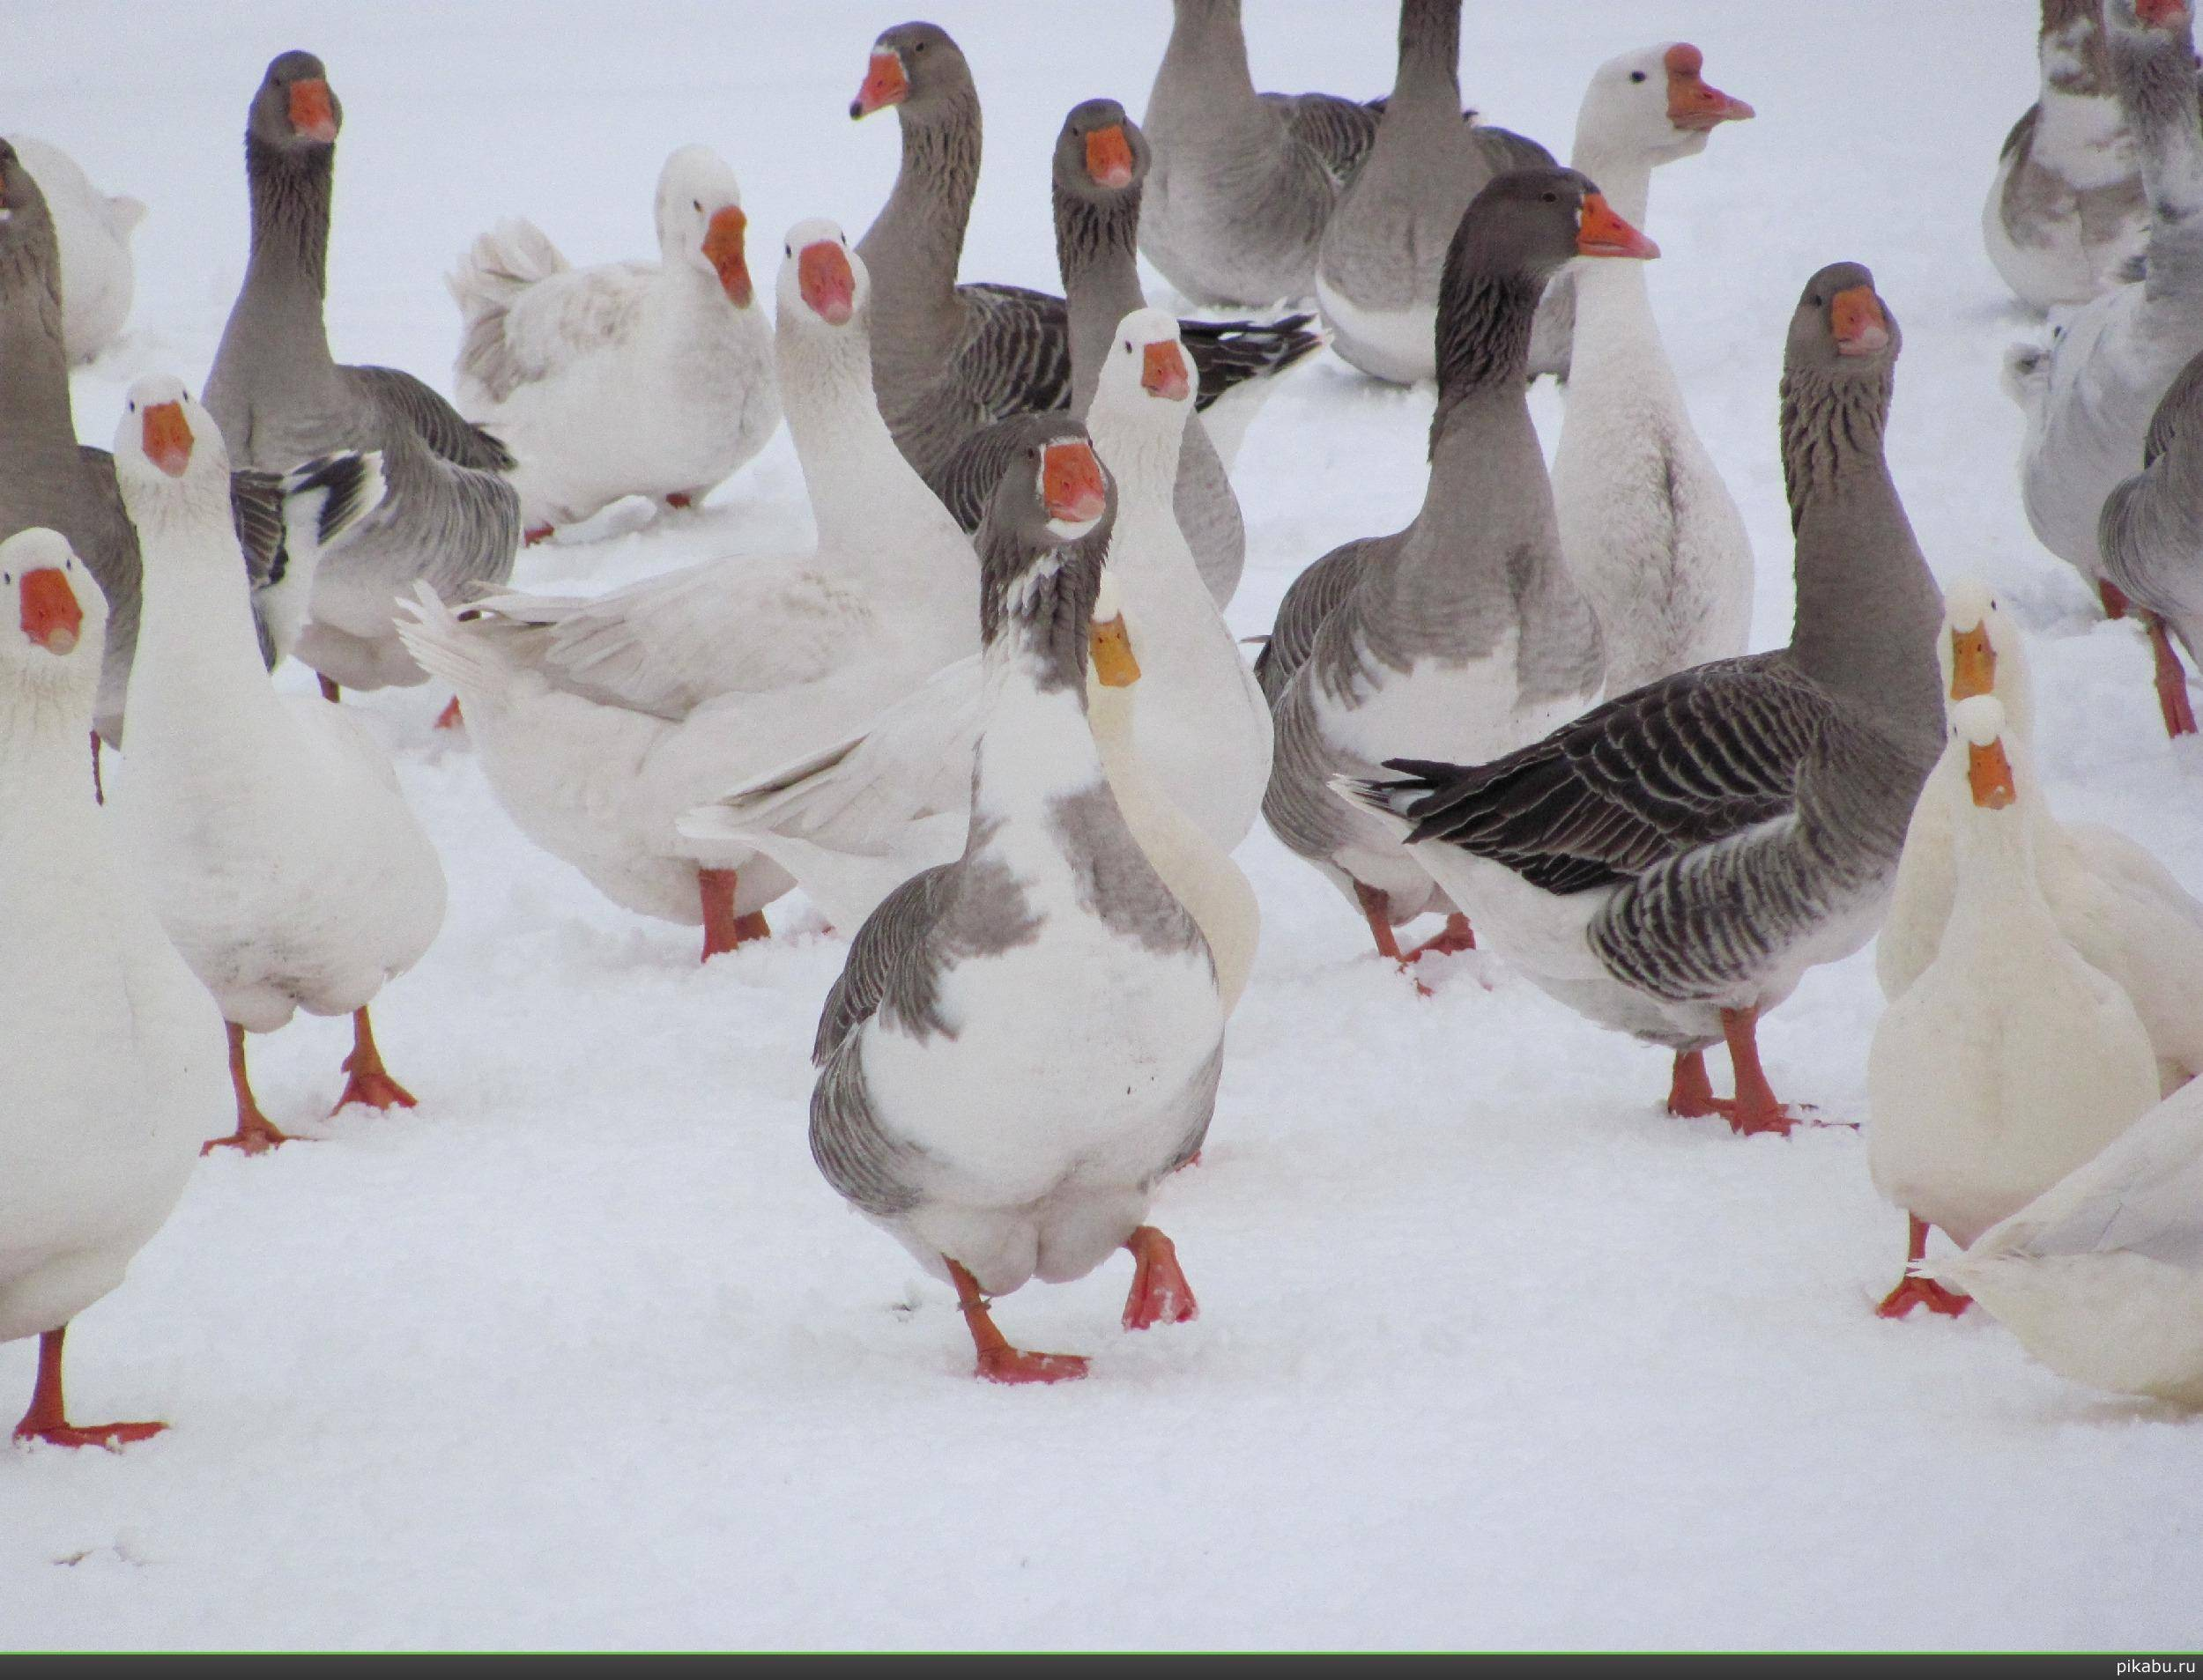 Рекомендации по откорму гусей на мясо в домашних условиях